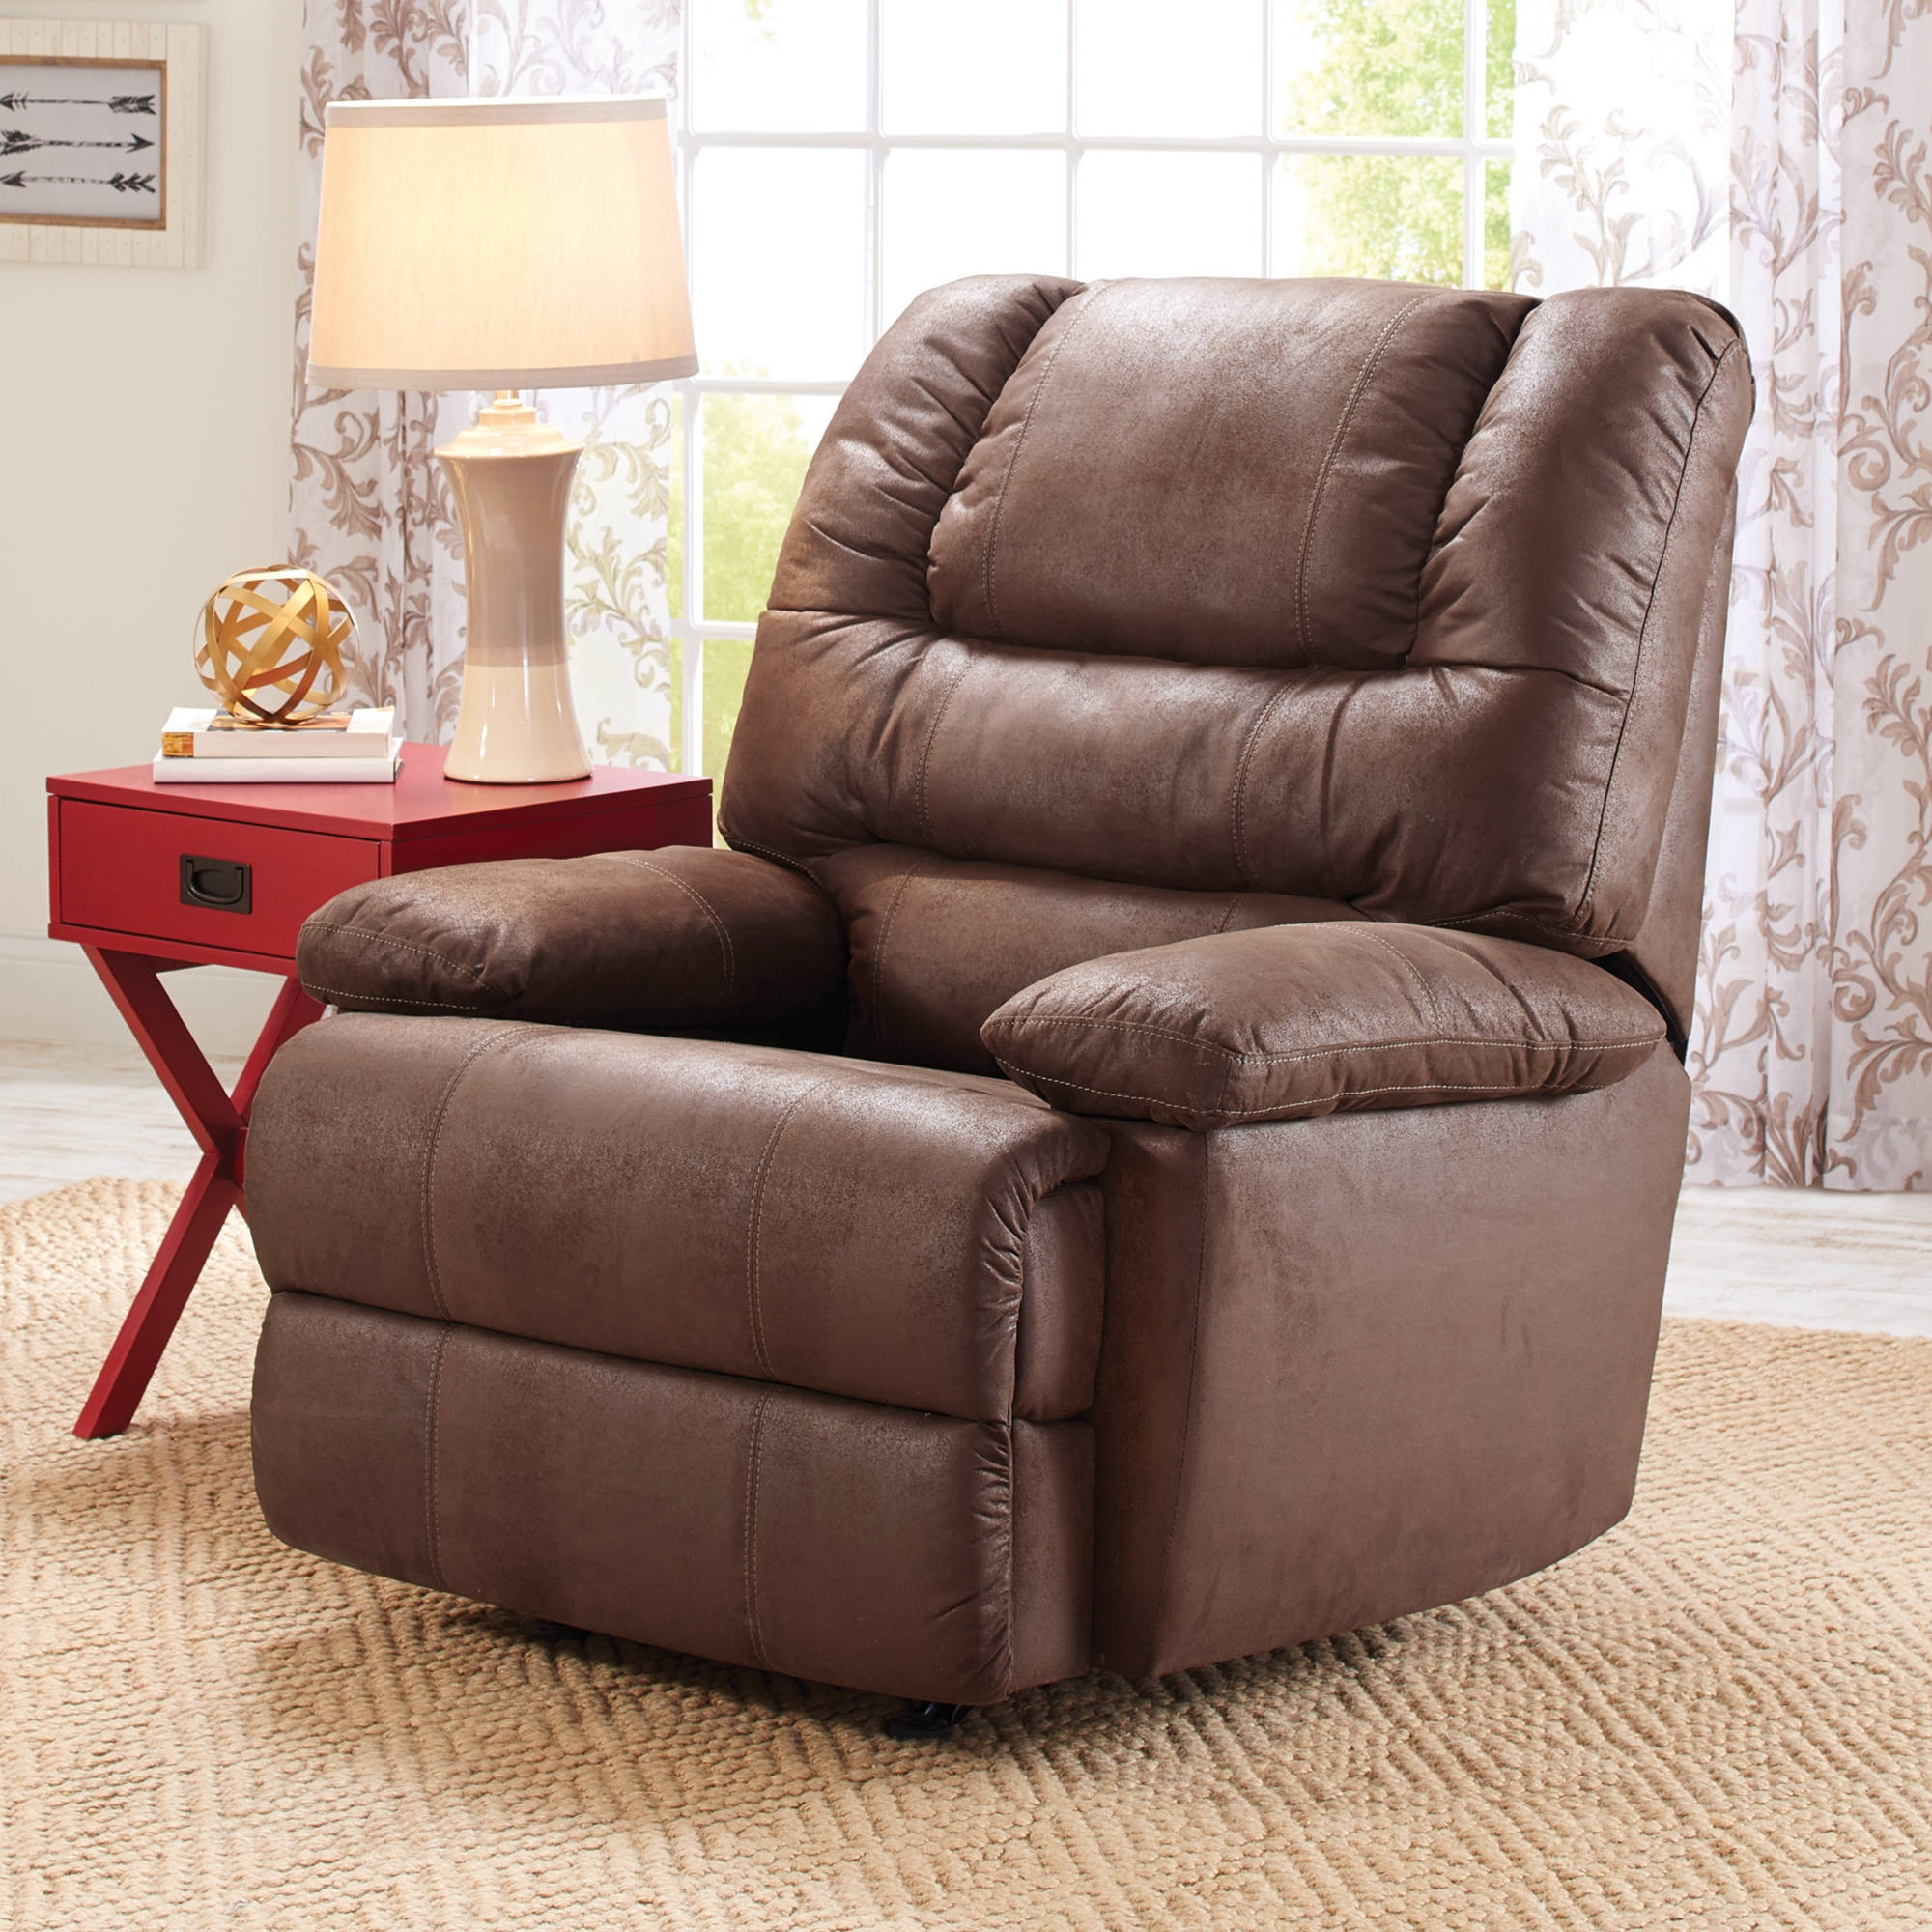 Round Sofa Chair Living Room Furniture Raya Furniture Throughout Living Room Sofa Chairs (Image 13 of 15)